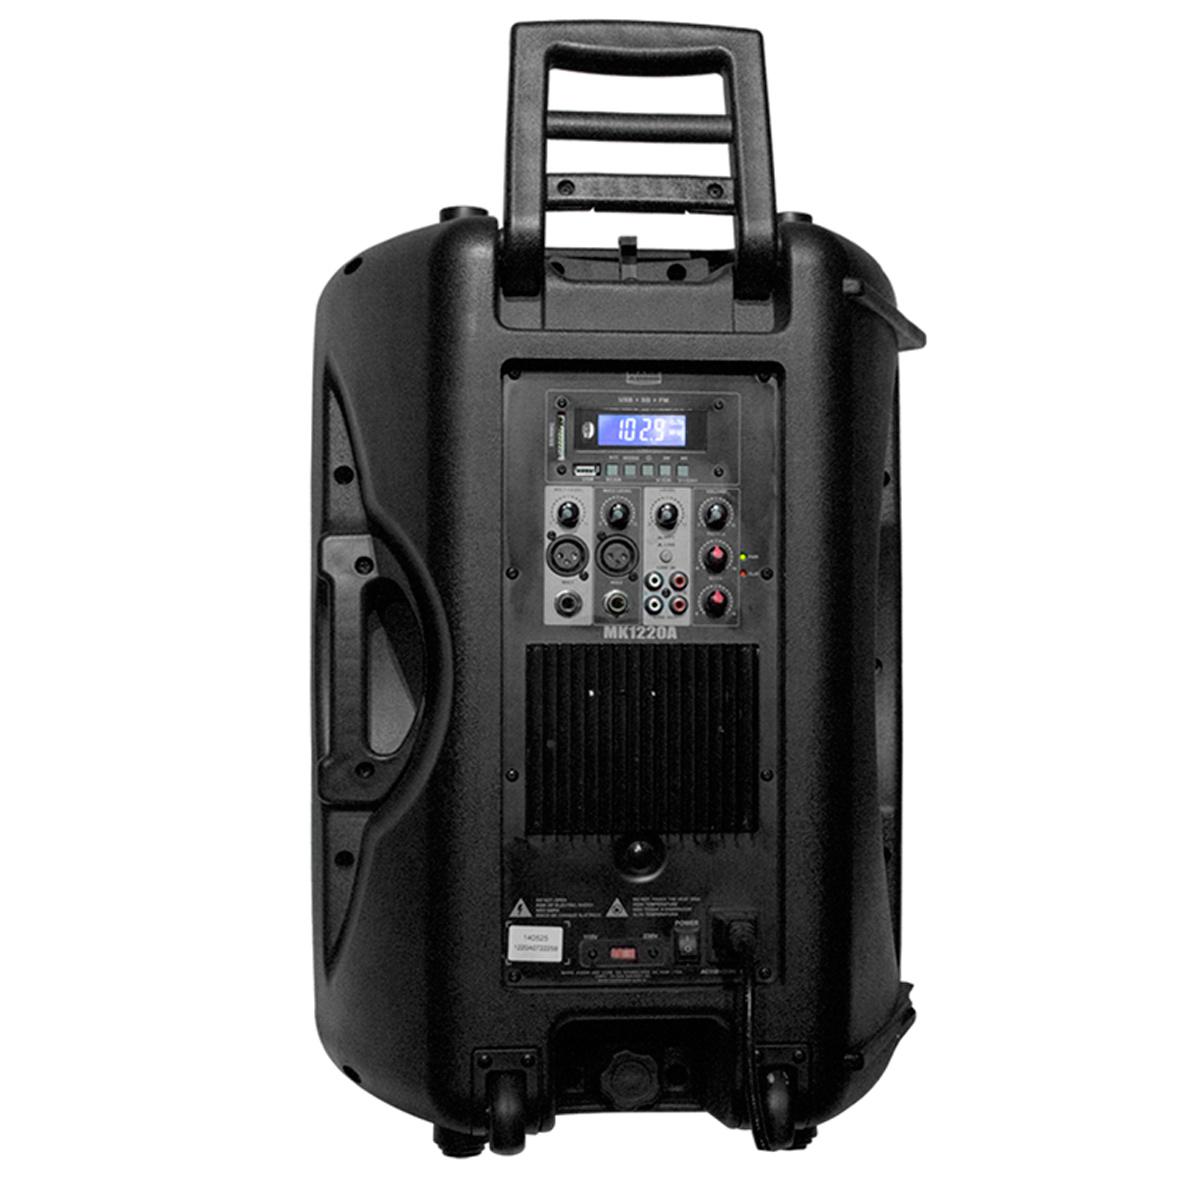 MK1220A - Caixa Ativa 200W c/ Player USB MK 1220 A - Mark Audio